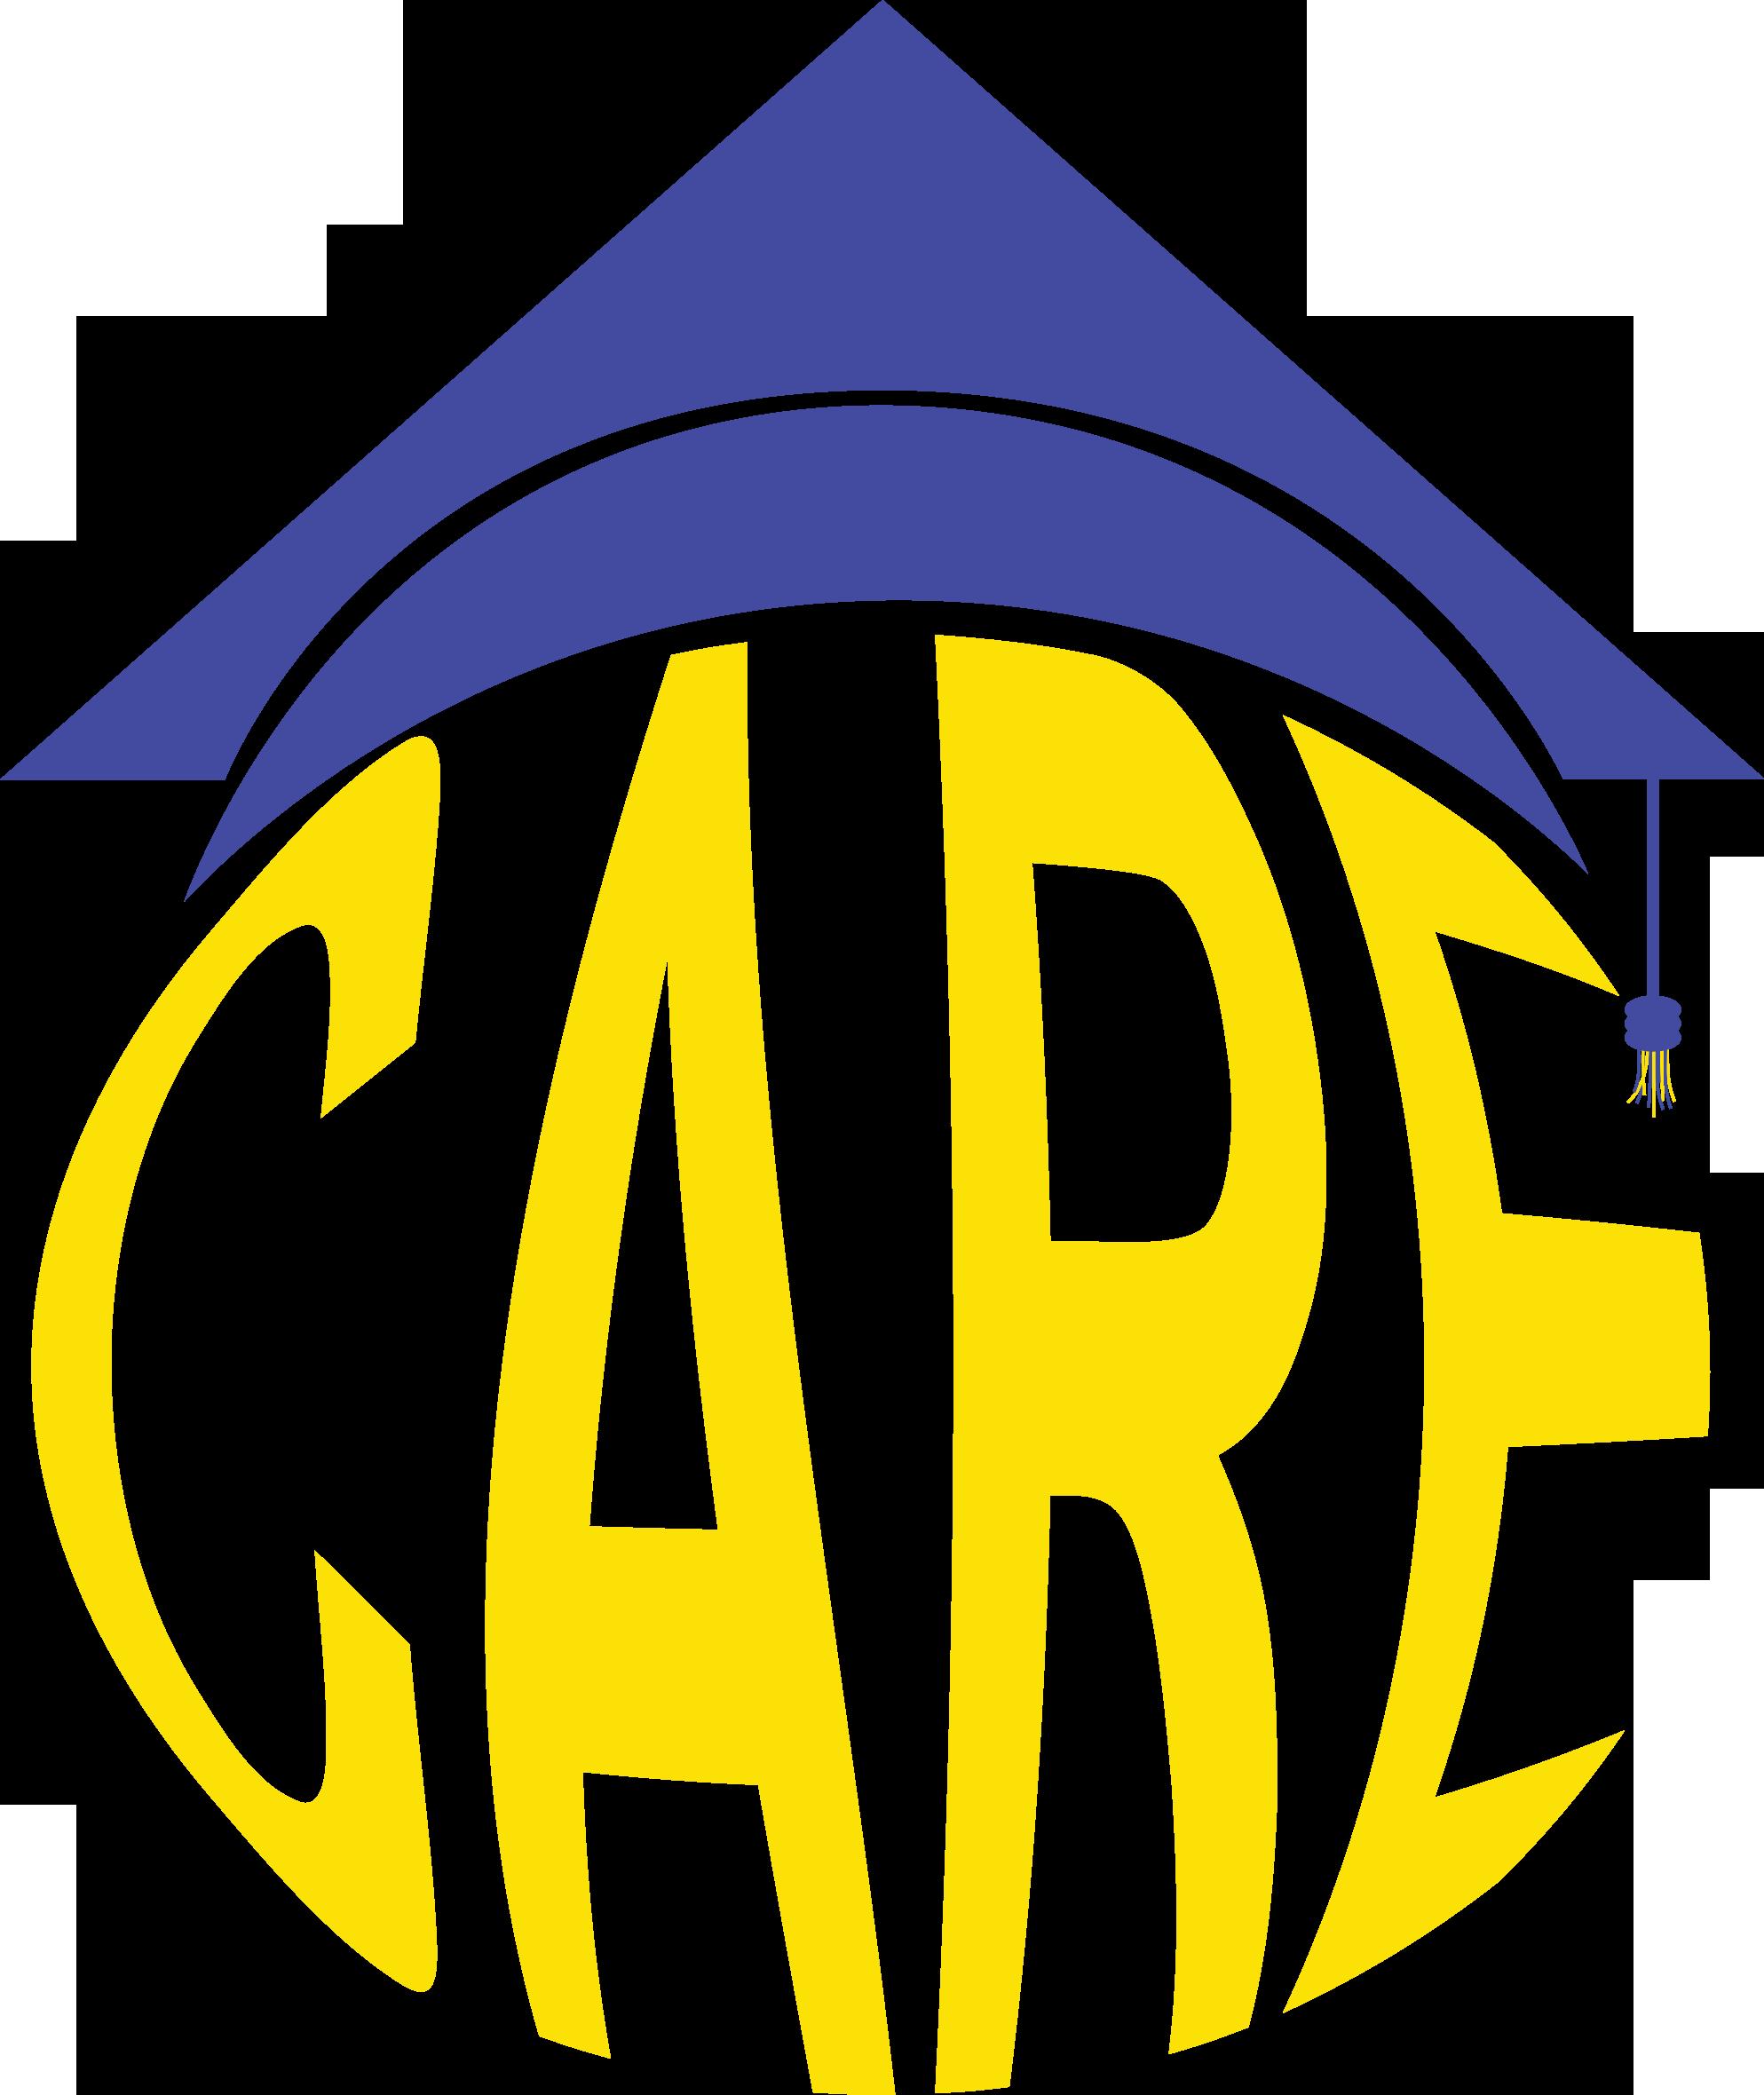 C.A.R.E. University Student Registration